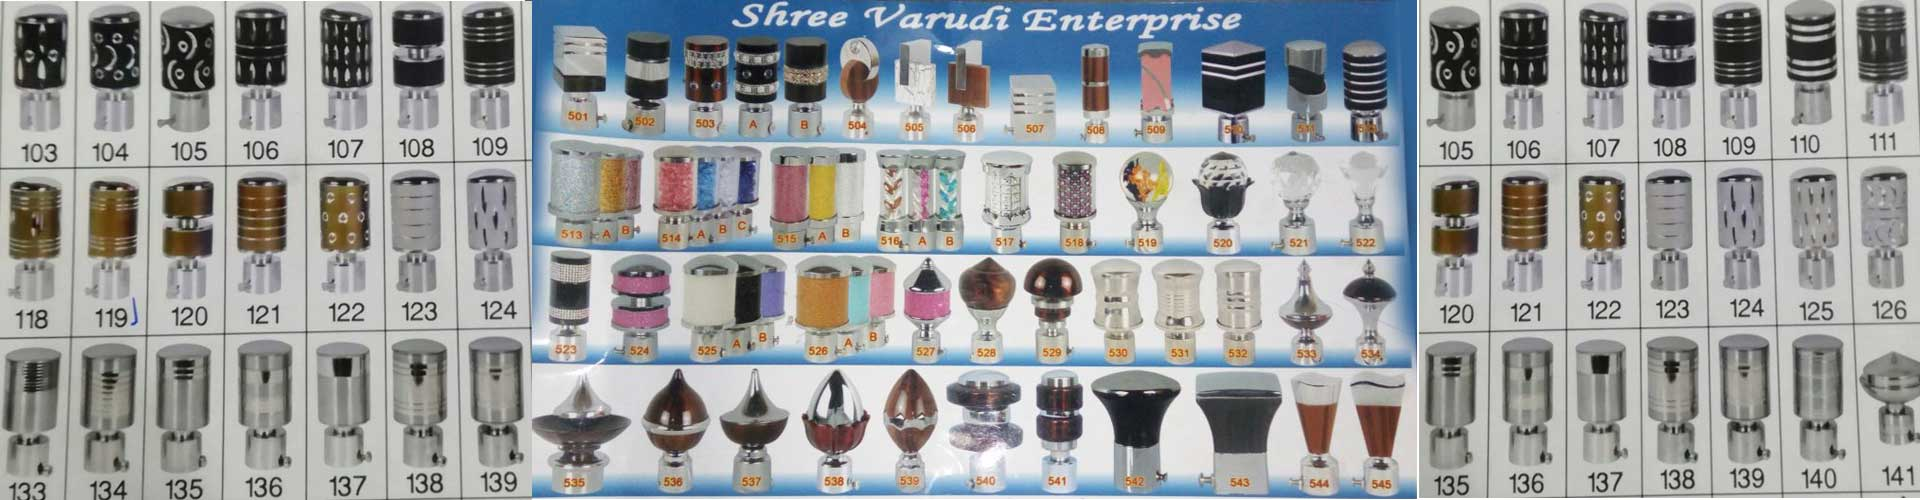 Shree Varudi Enterprises - Banner Image